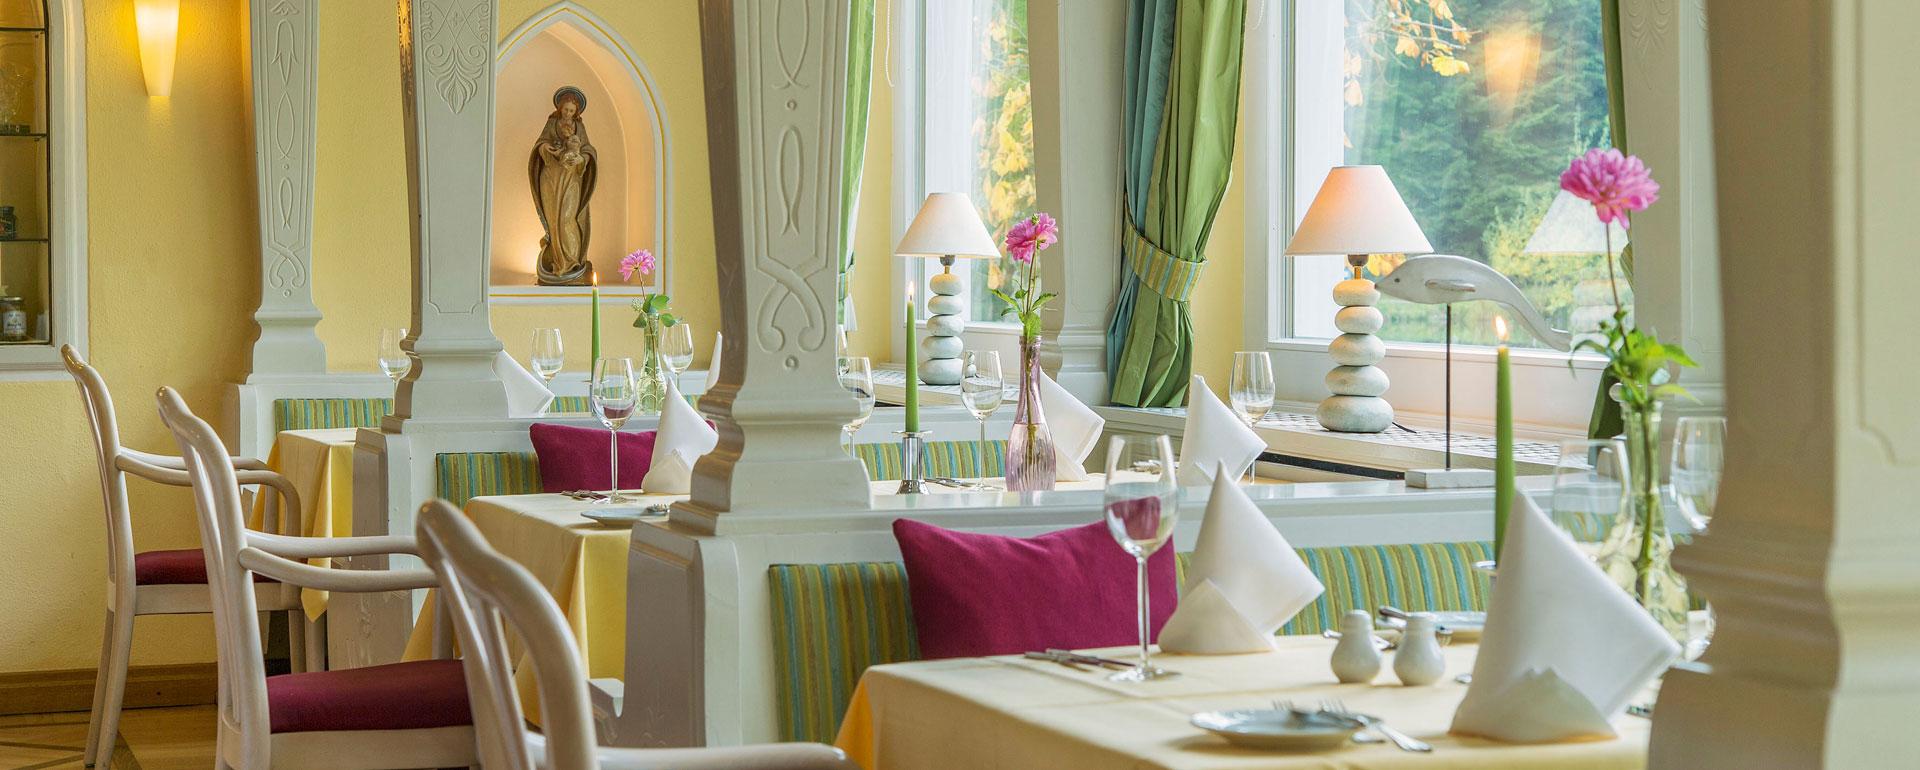 hotel waldsee lindenberg allgaeu ts 1